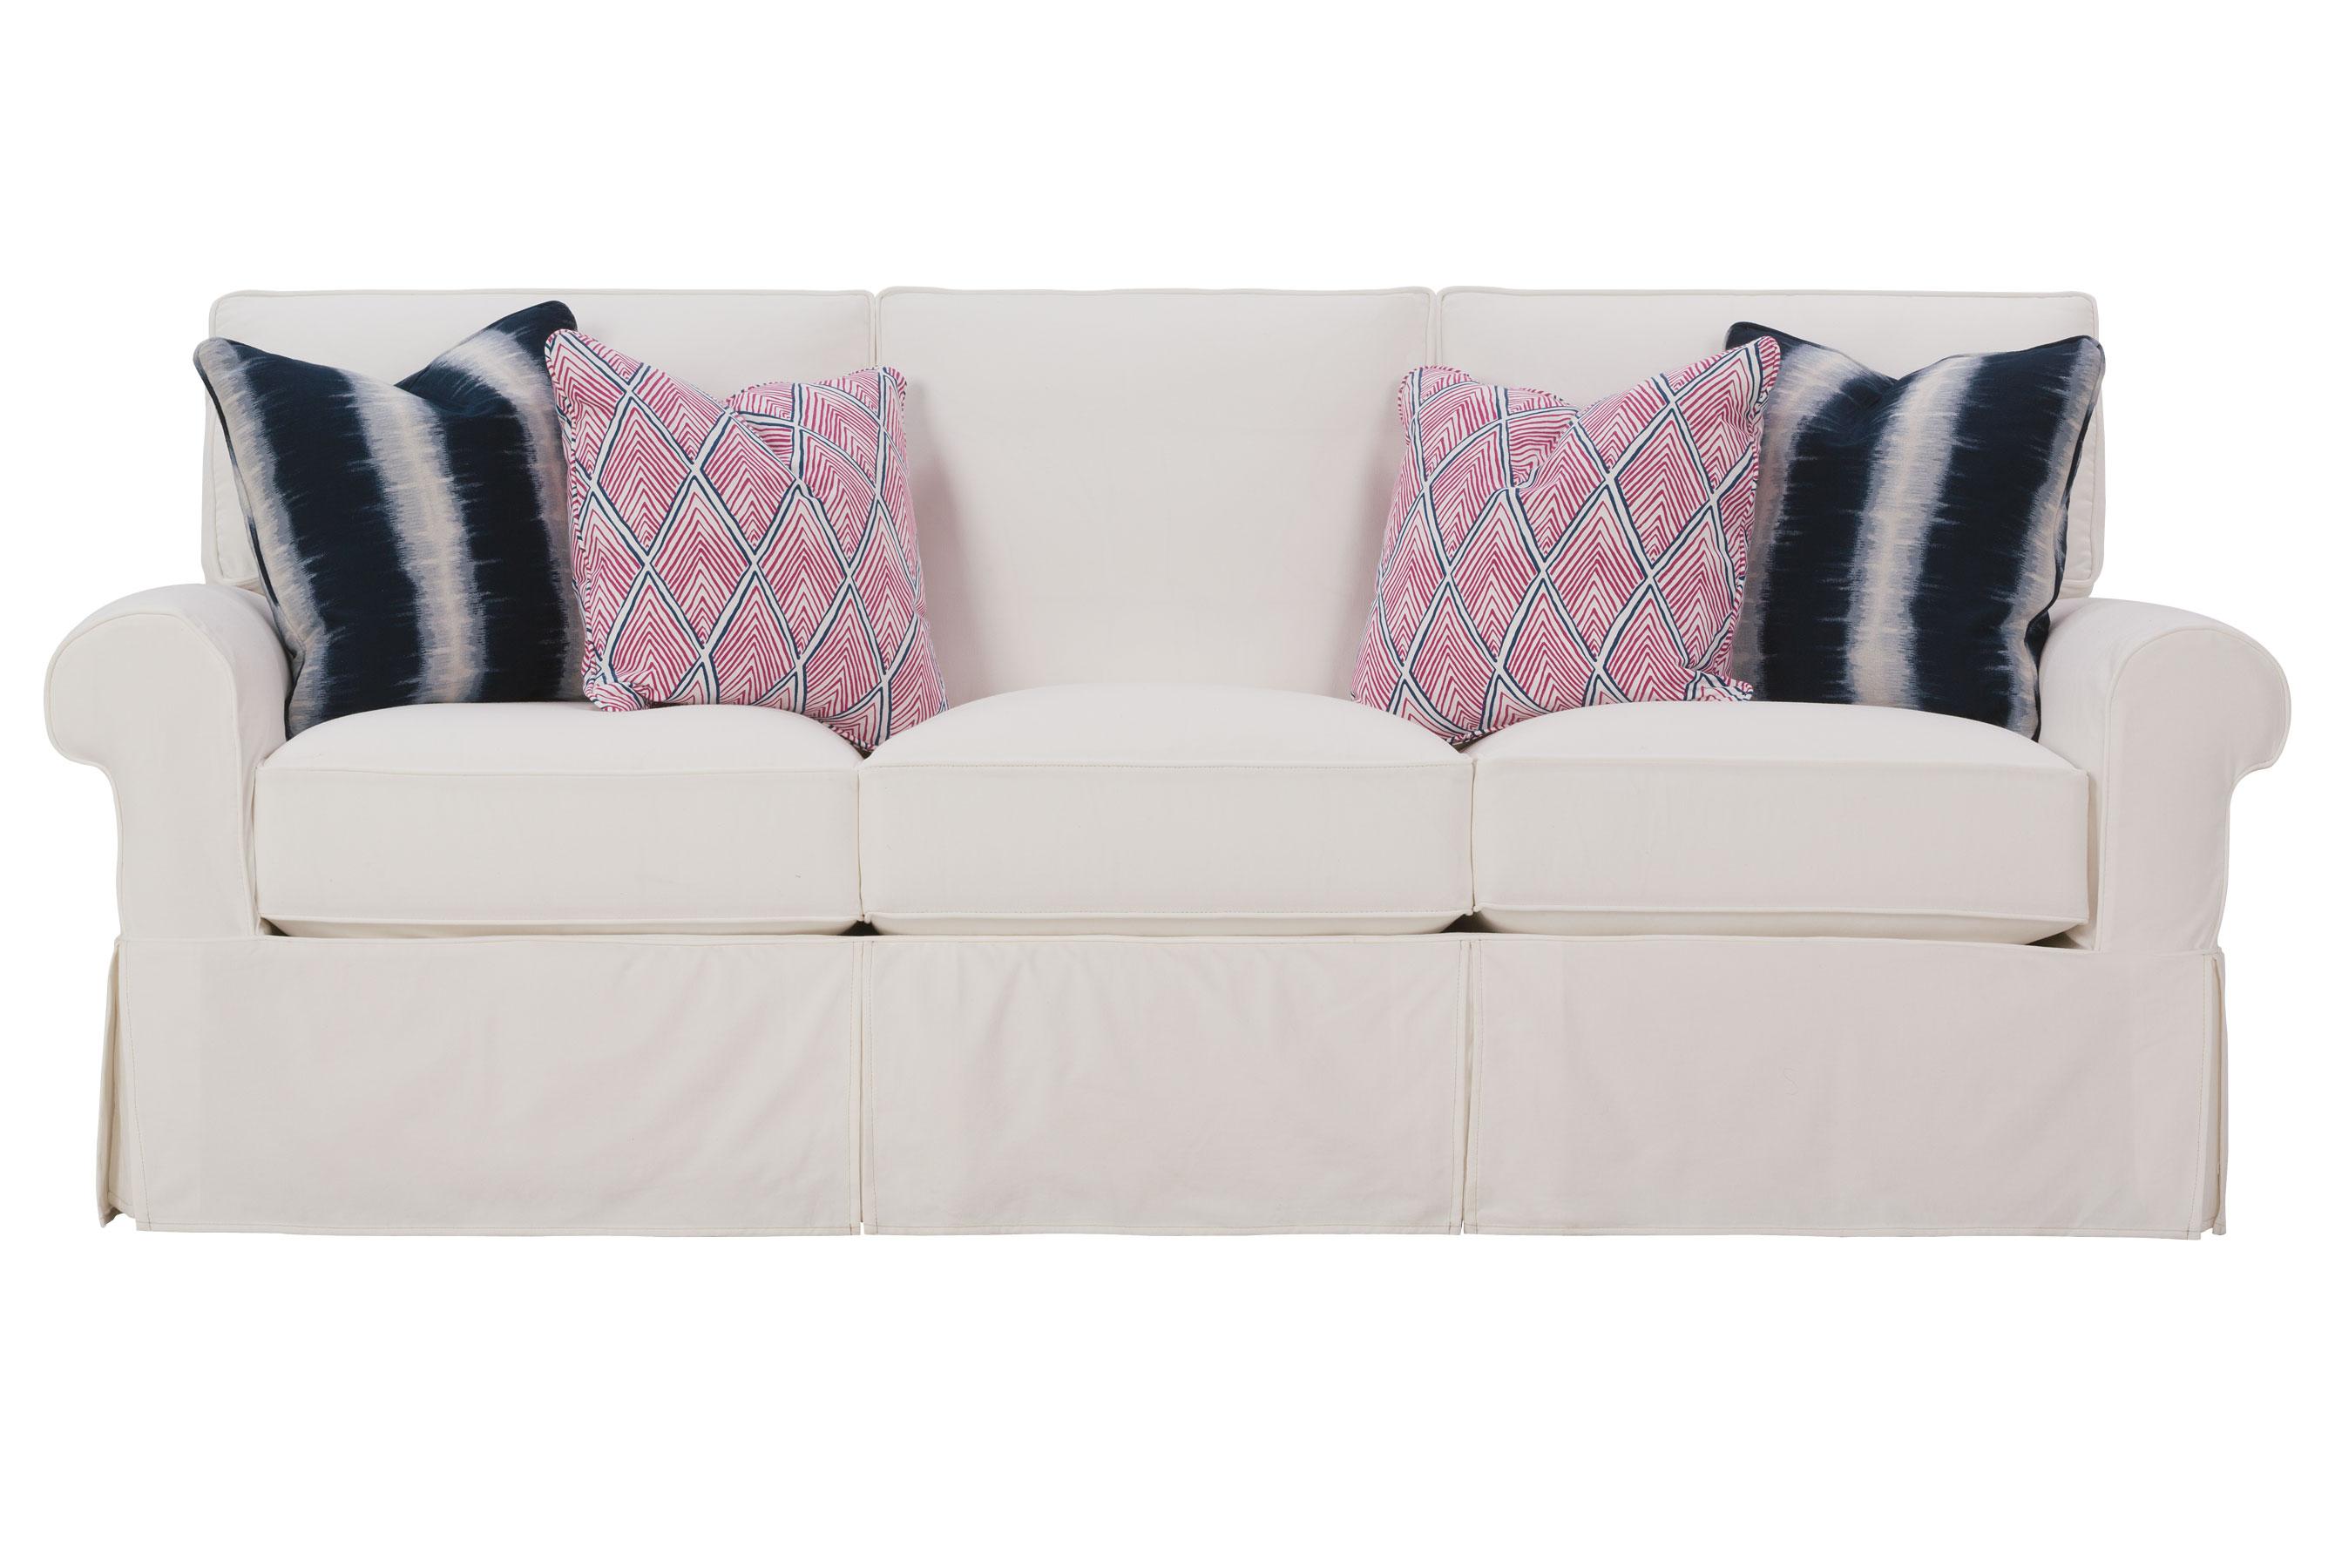 Pleasant Easton P275 Slipcover 90 Sofa Sofas And Sectionals Creativecarmelina Interior Chair Design Creativecarmelinacom